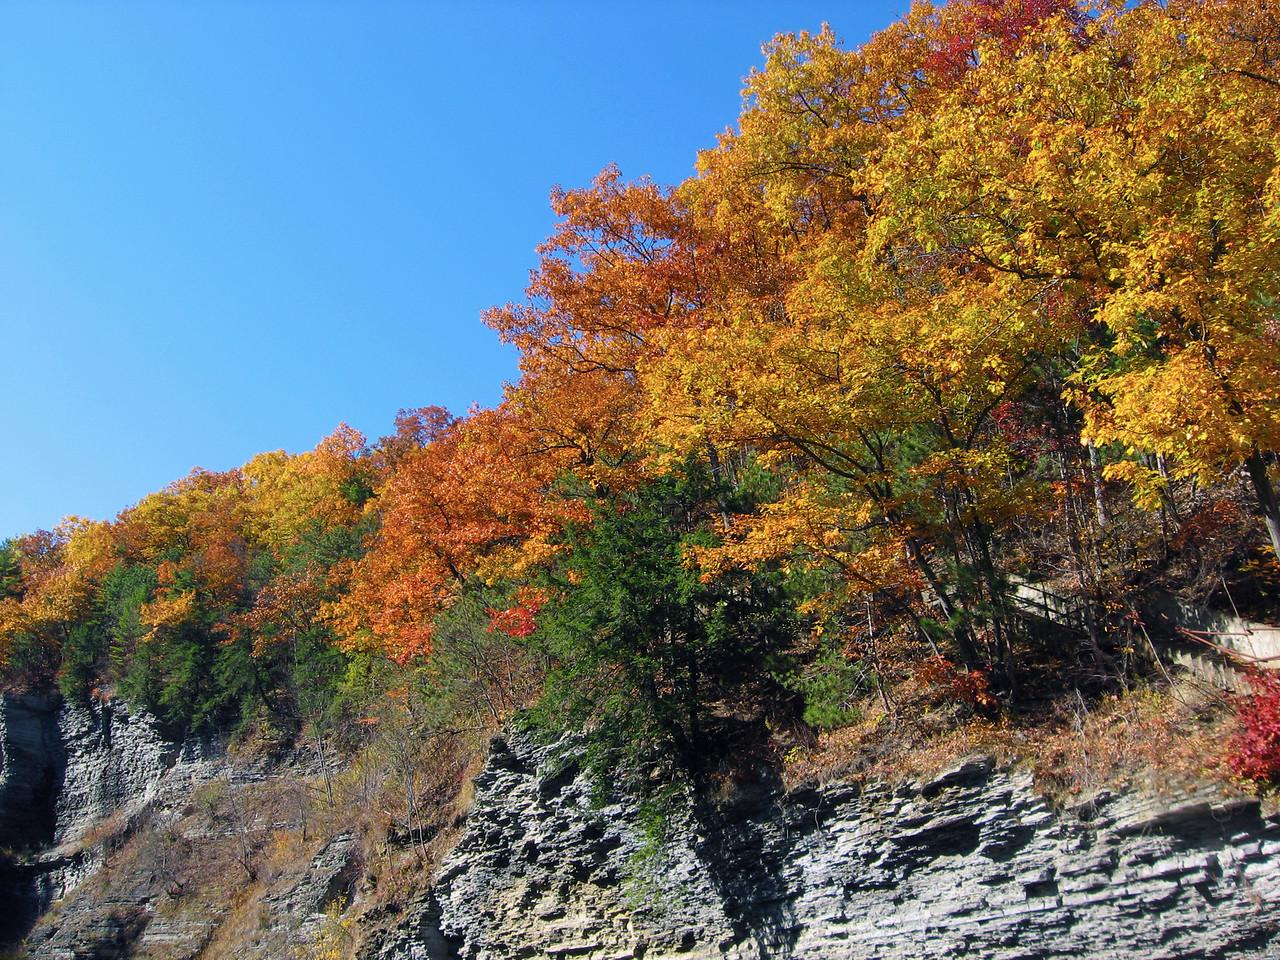 Foliage on the Bluff